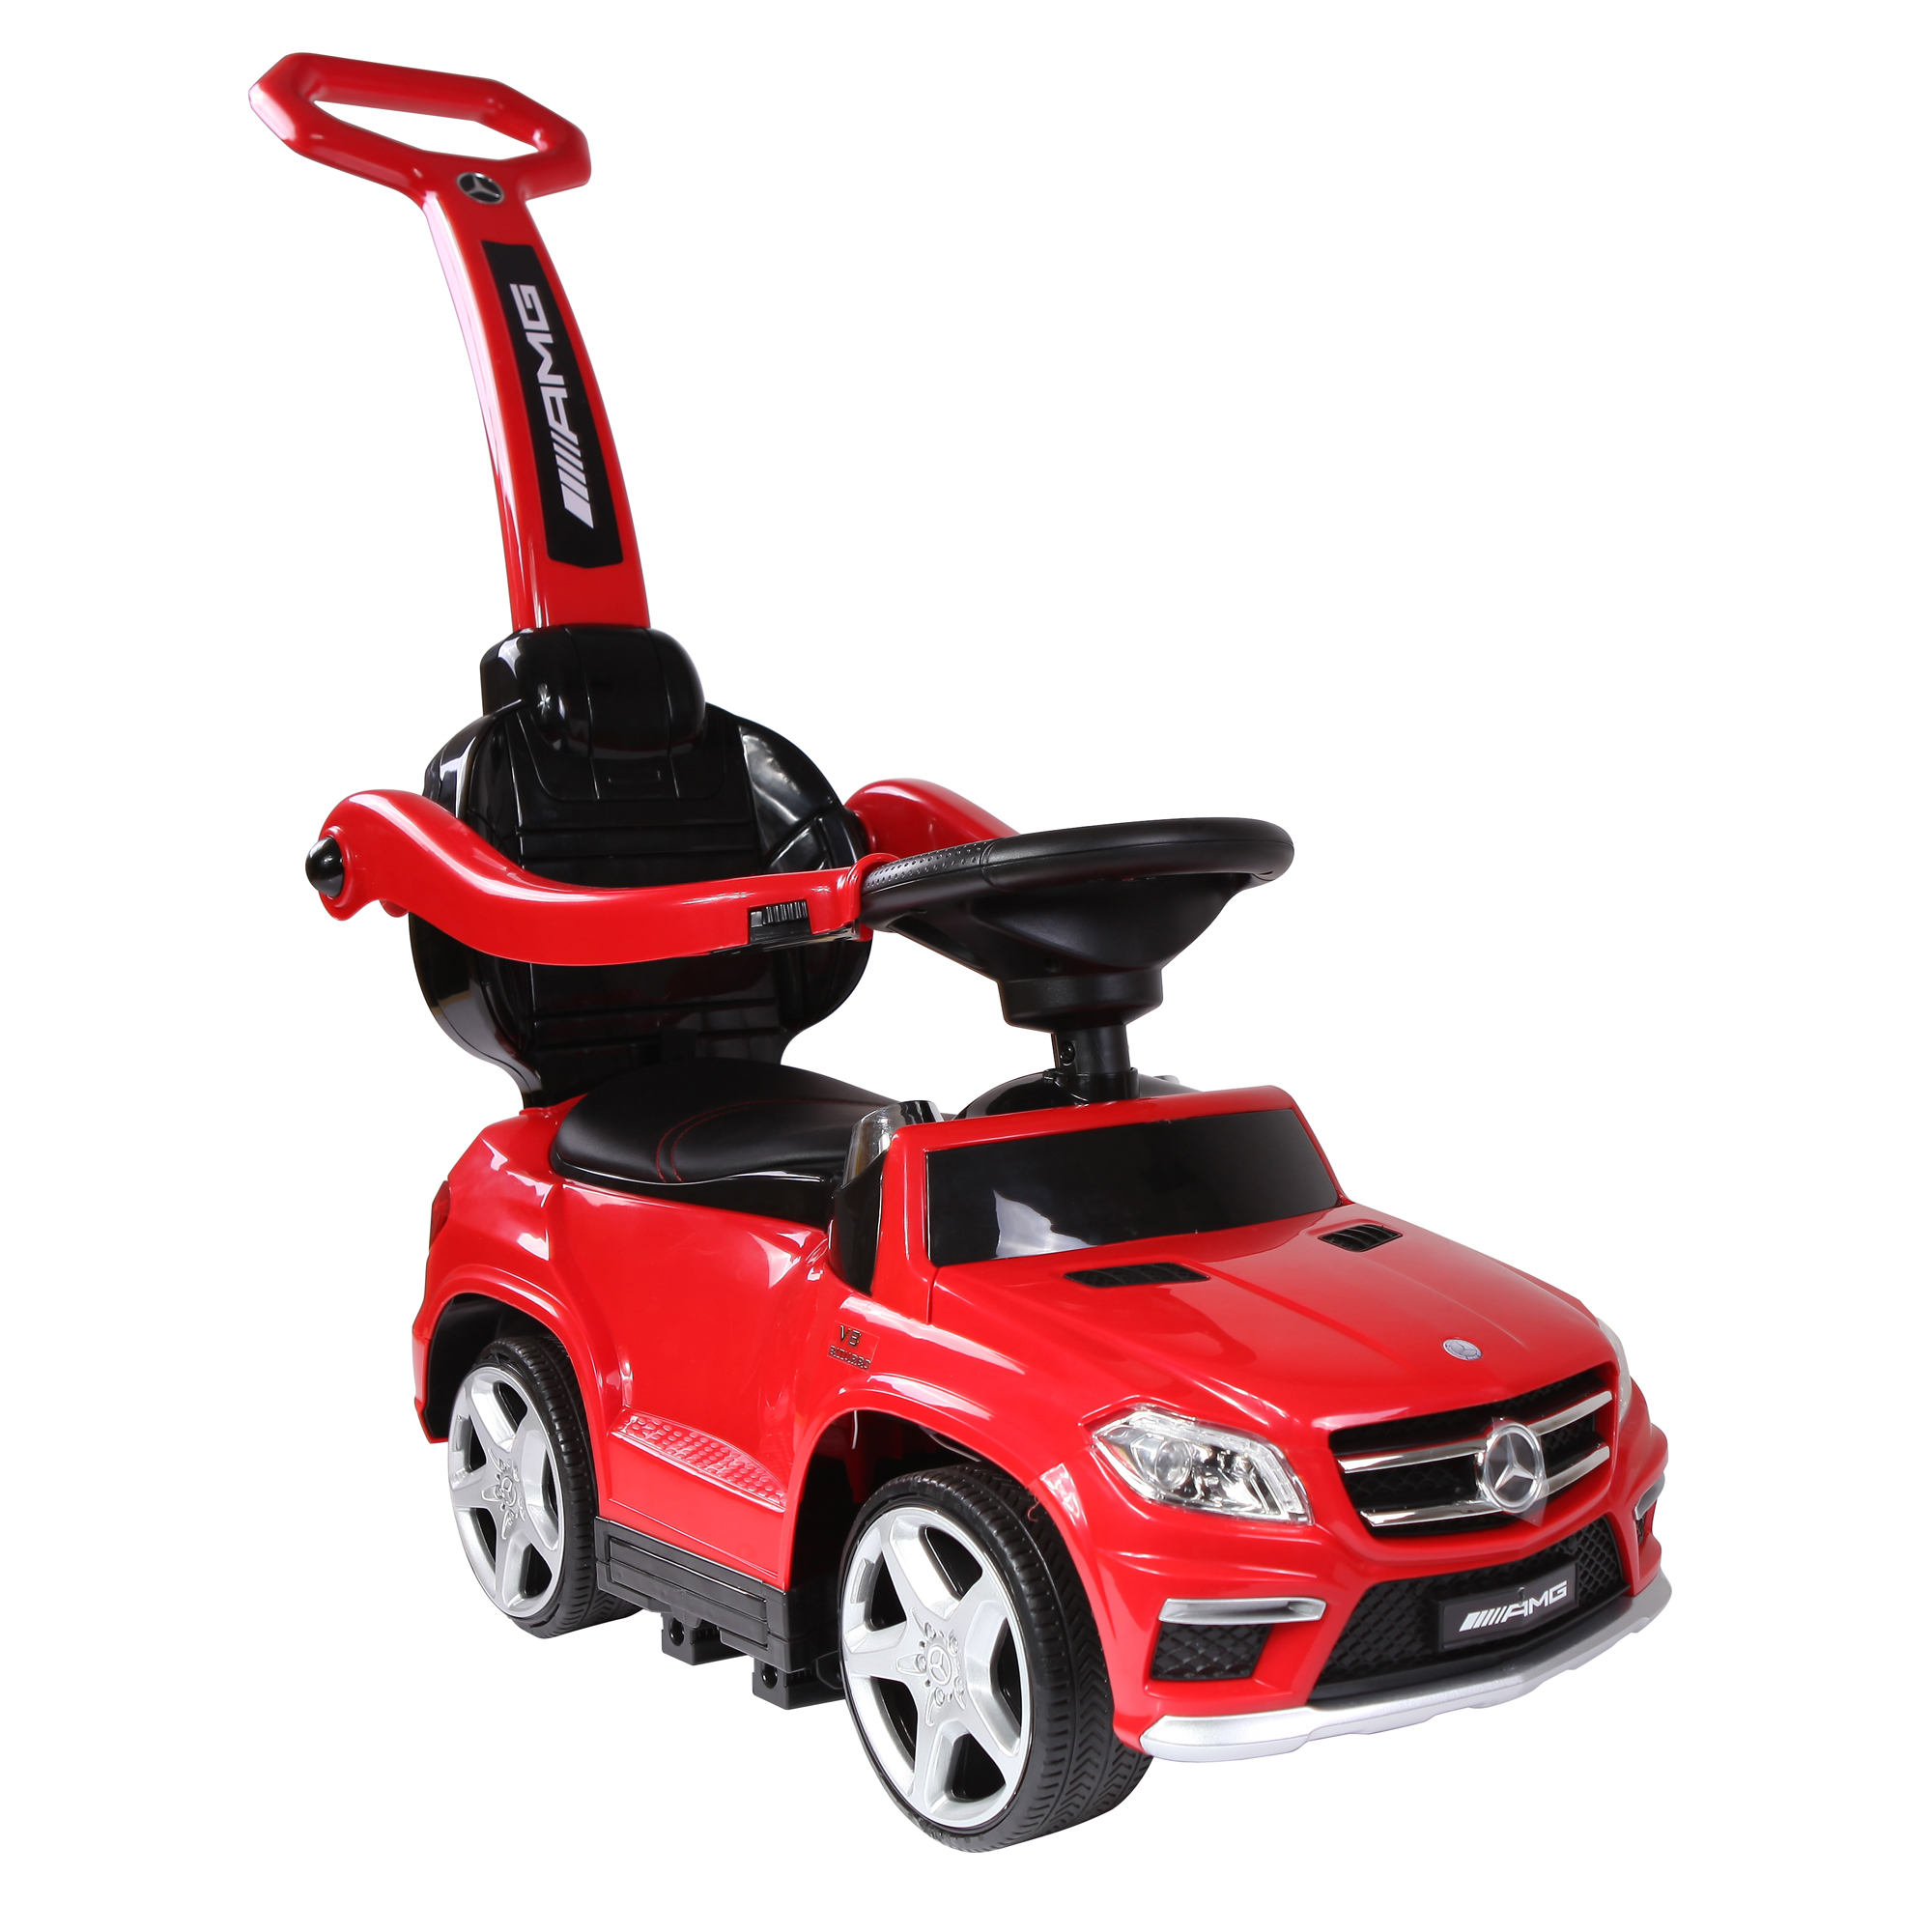 Best Ride On Cars Baby Toddler 4 In 1 Mercedes Push Car Stroller W Lights Red Walmart Com Walmart Com